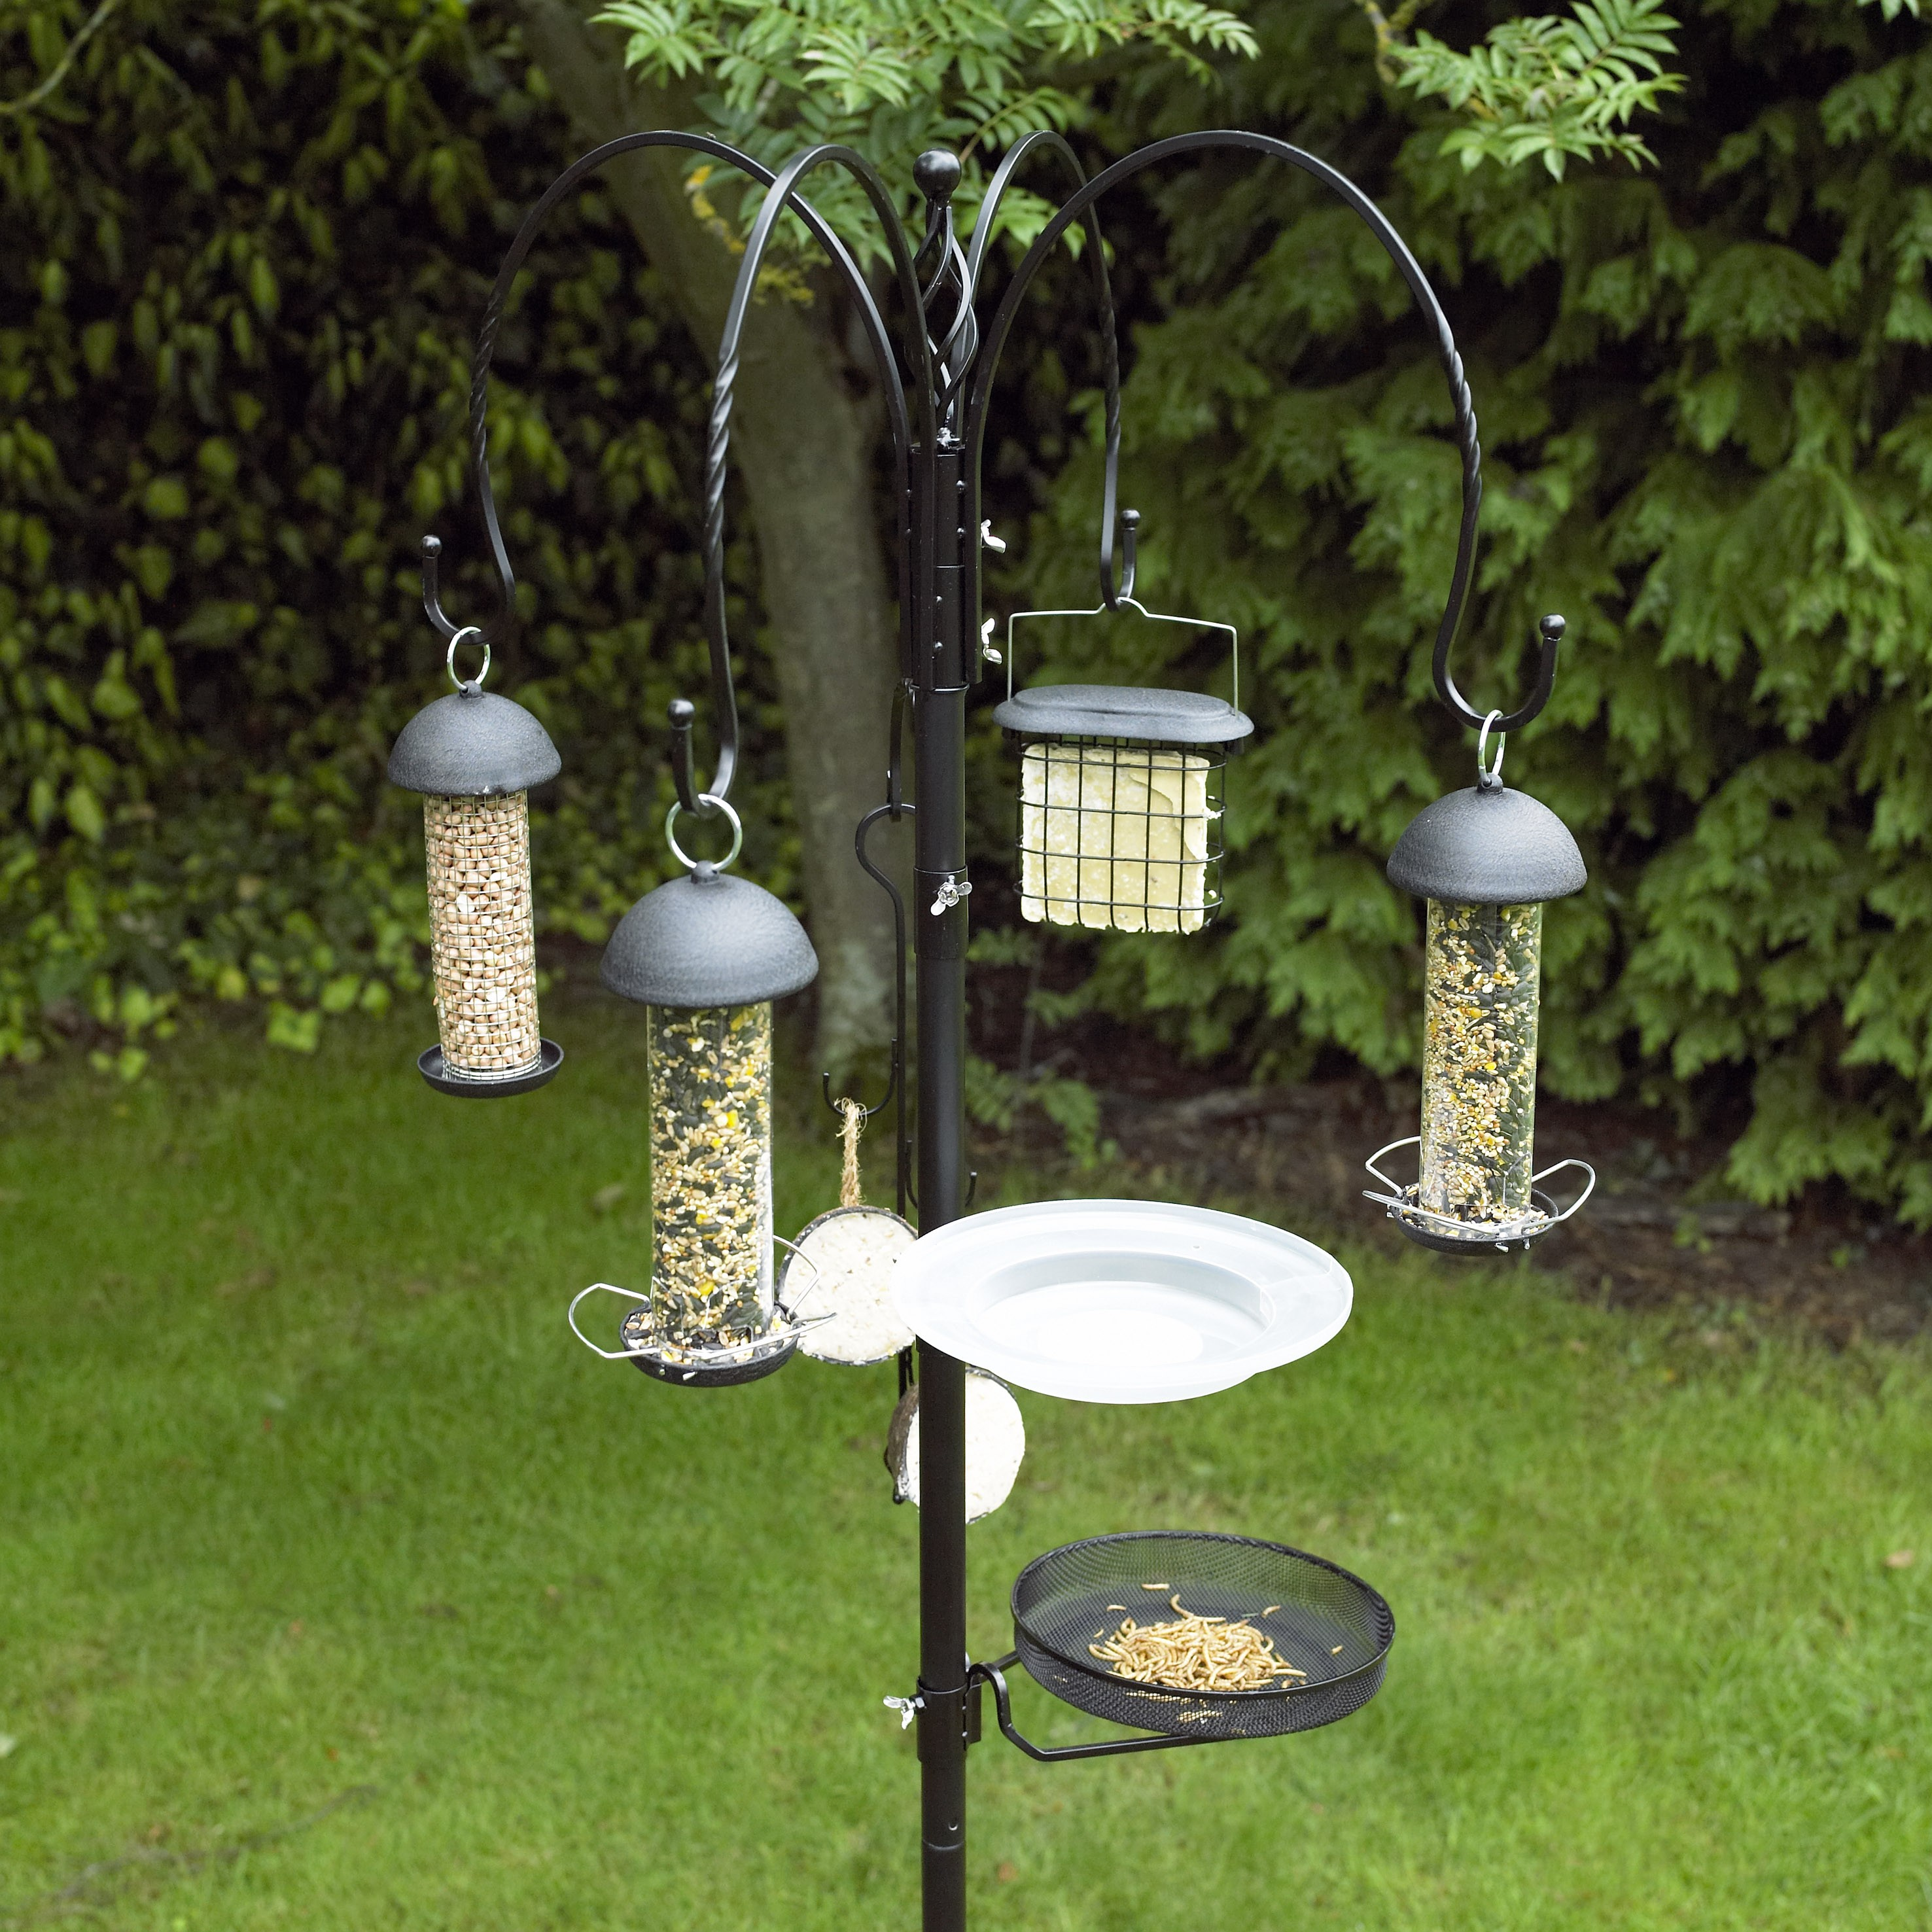 Bird Baths, Feeders & Tables SUET CAKE BIRD FEEDER OUTDOOR WILD FEED HANGING FEEDER HOLDER GARDEN LIGHT GREEN